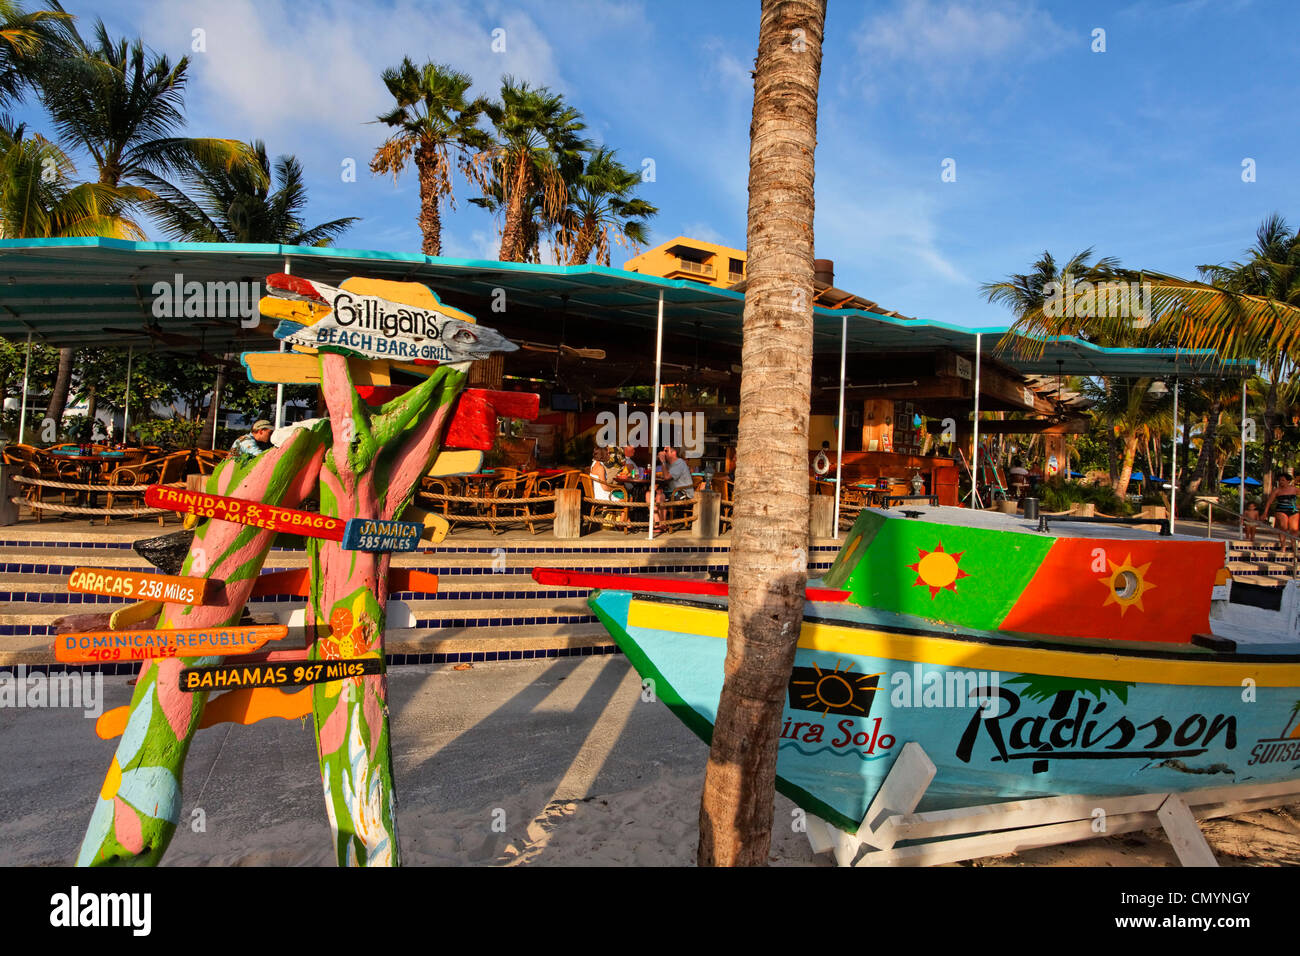 Aruba, Palm Beach, Sunset Bar, Gilligans Bar, Radisson Hotel, West Indies, Dutch Carribean, Central America - Stock Image